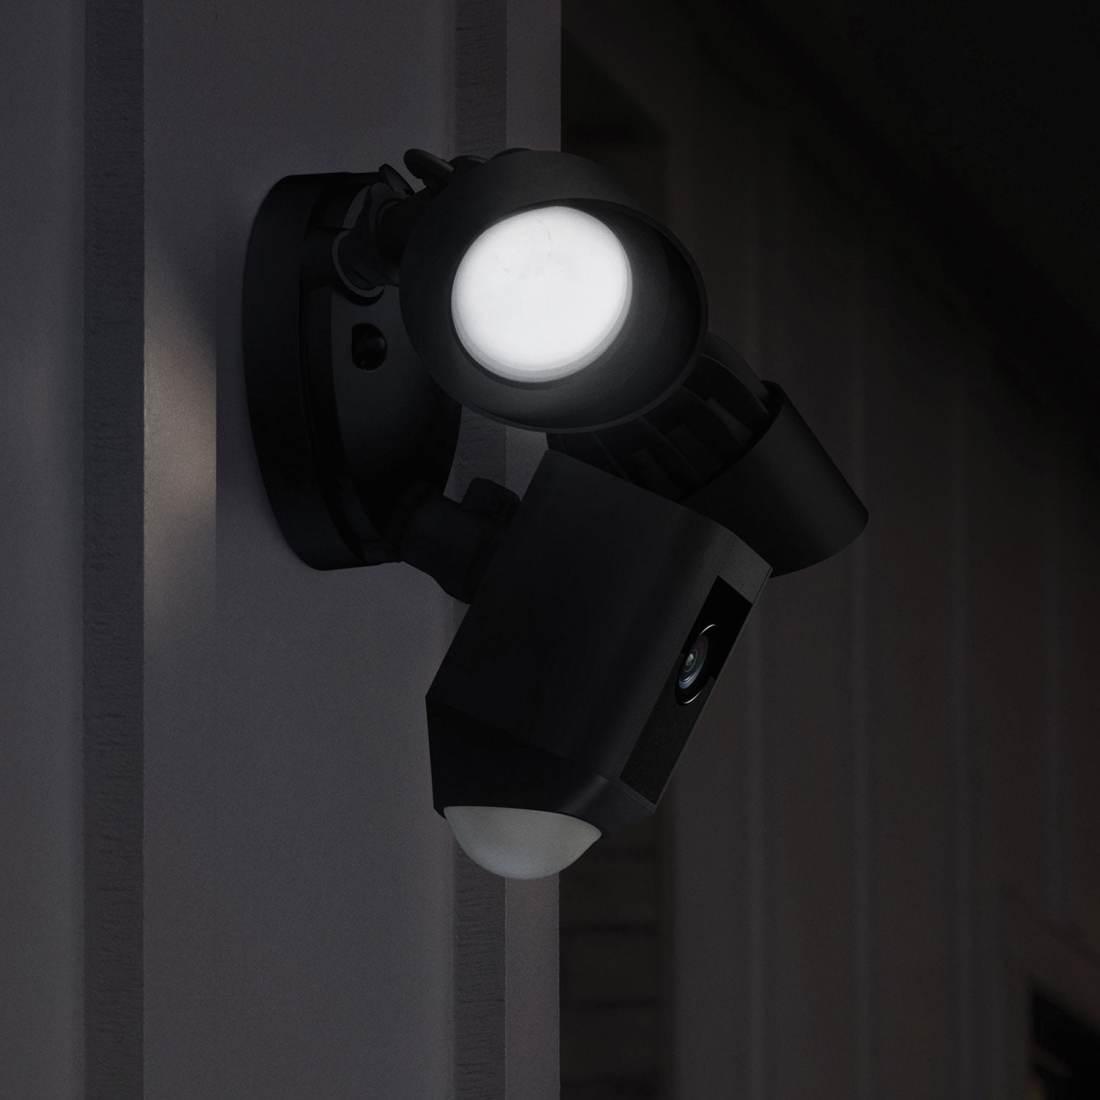 Ring Floodlight Cam Black